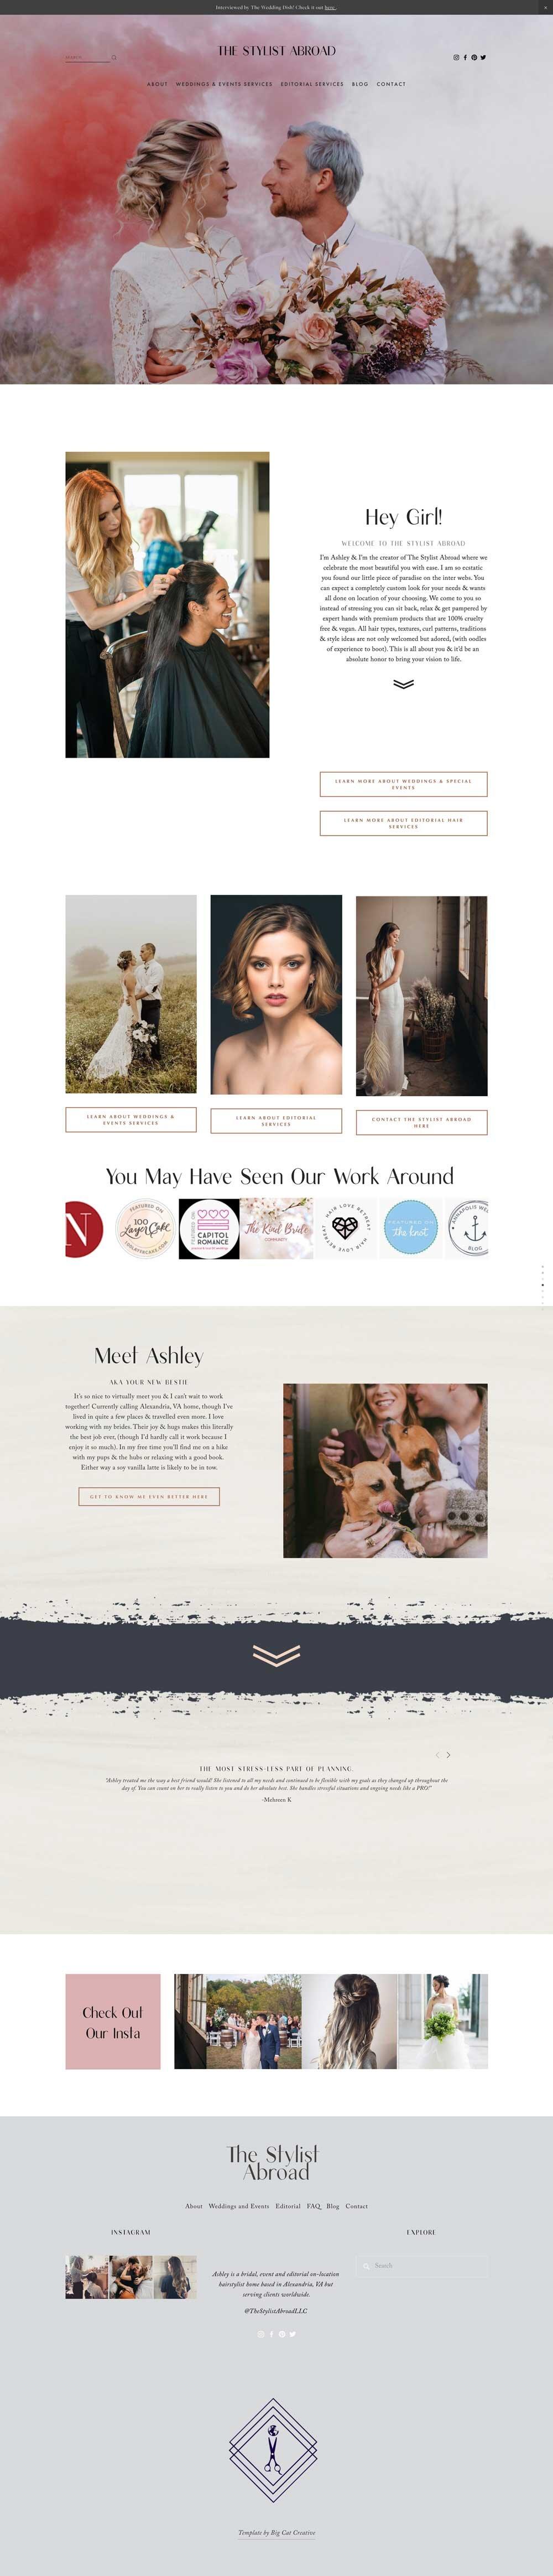 Big-Cat-Creative-Squarespace-Website-Template-Kits-Sophie-Showcase-4.jpg